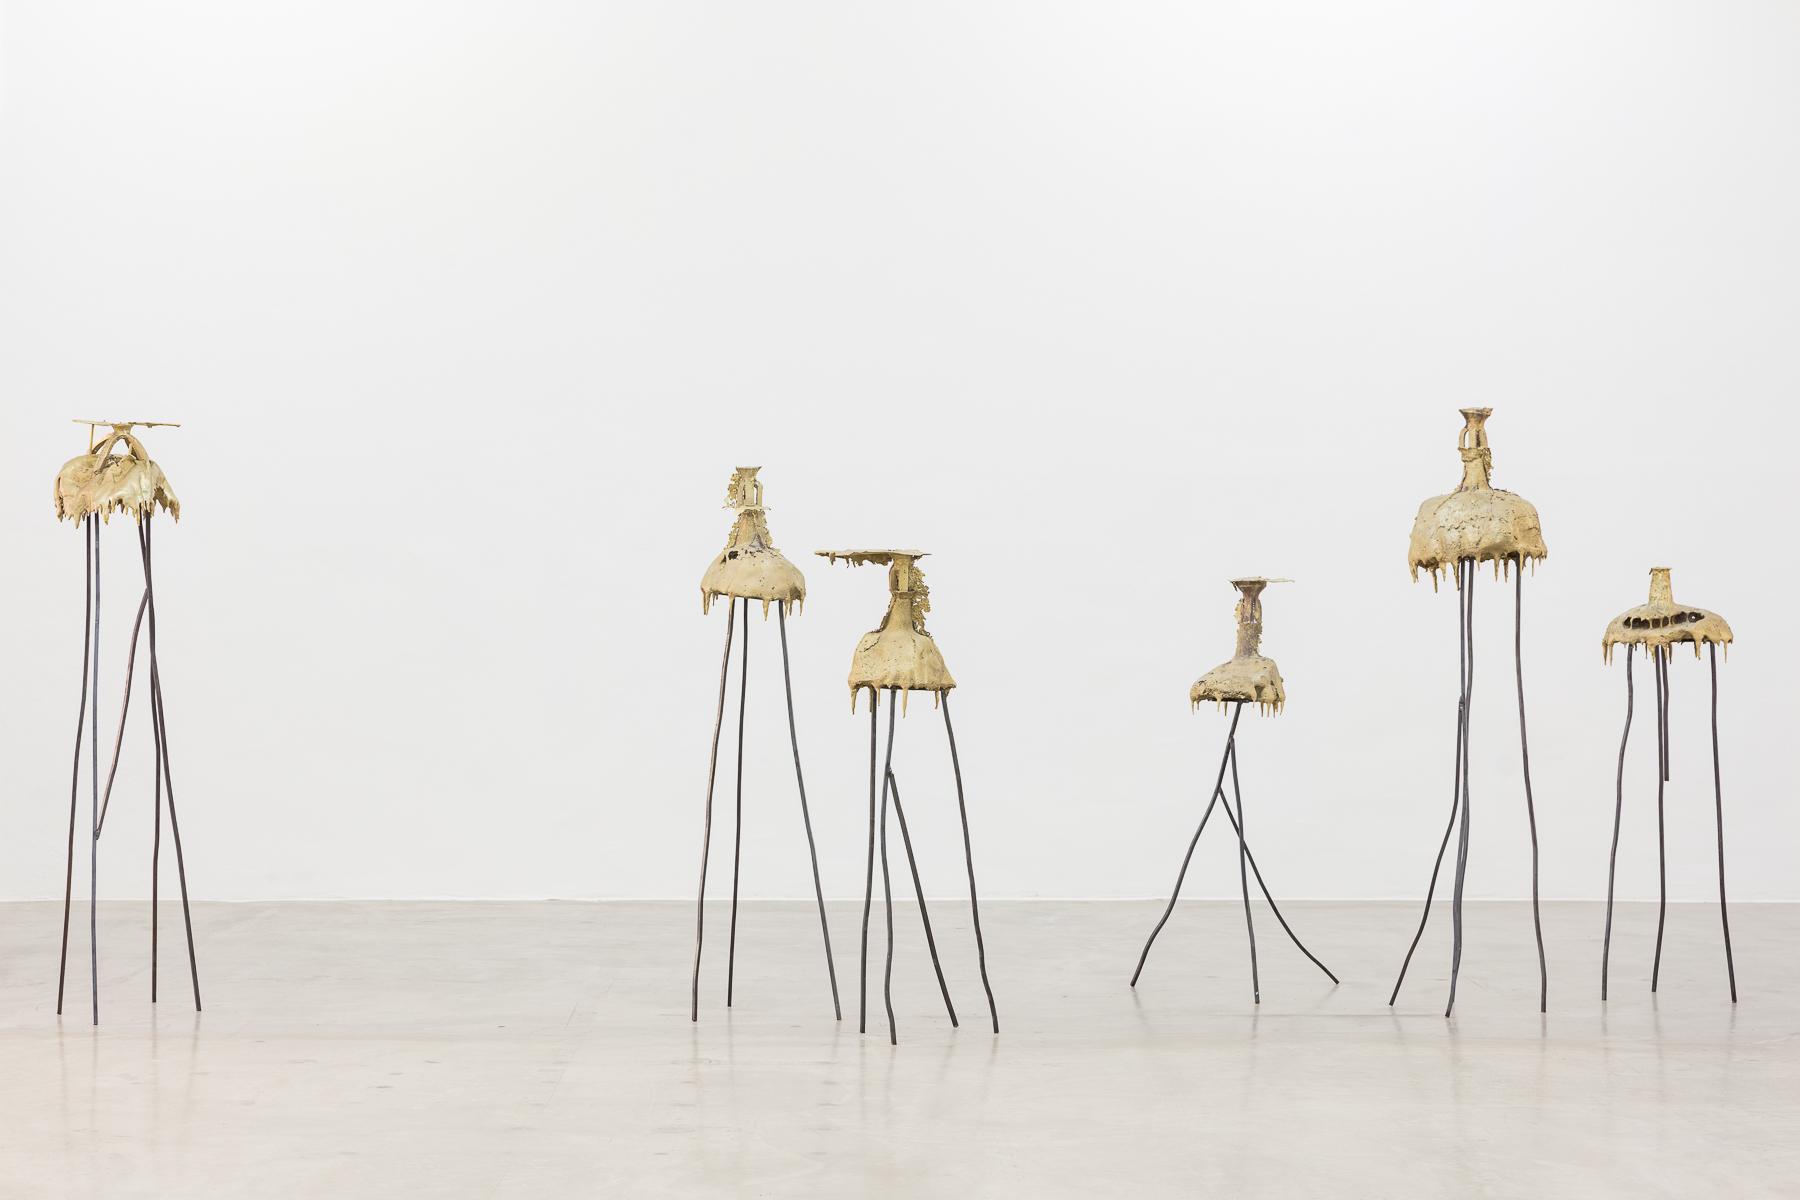 2019_02_19_Angelika Loderer_Kunstverein Graz_by_kunstdokumentationcom_008_web.jpg